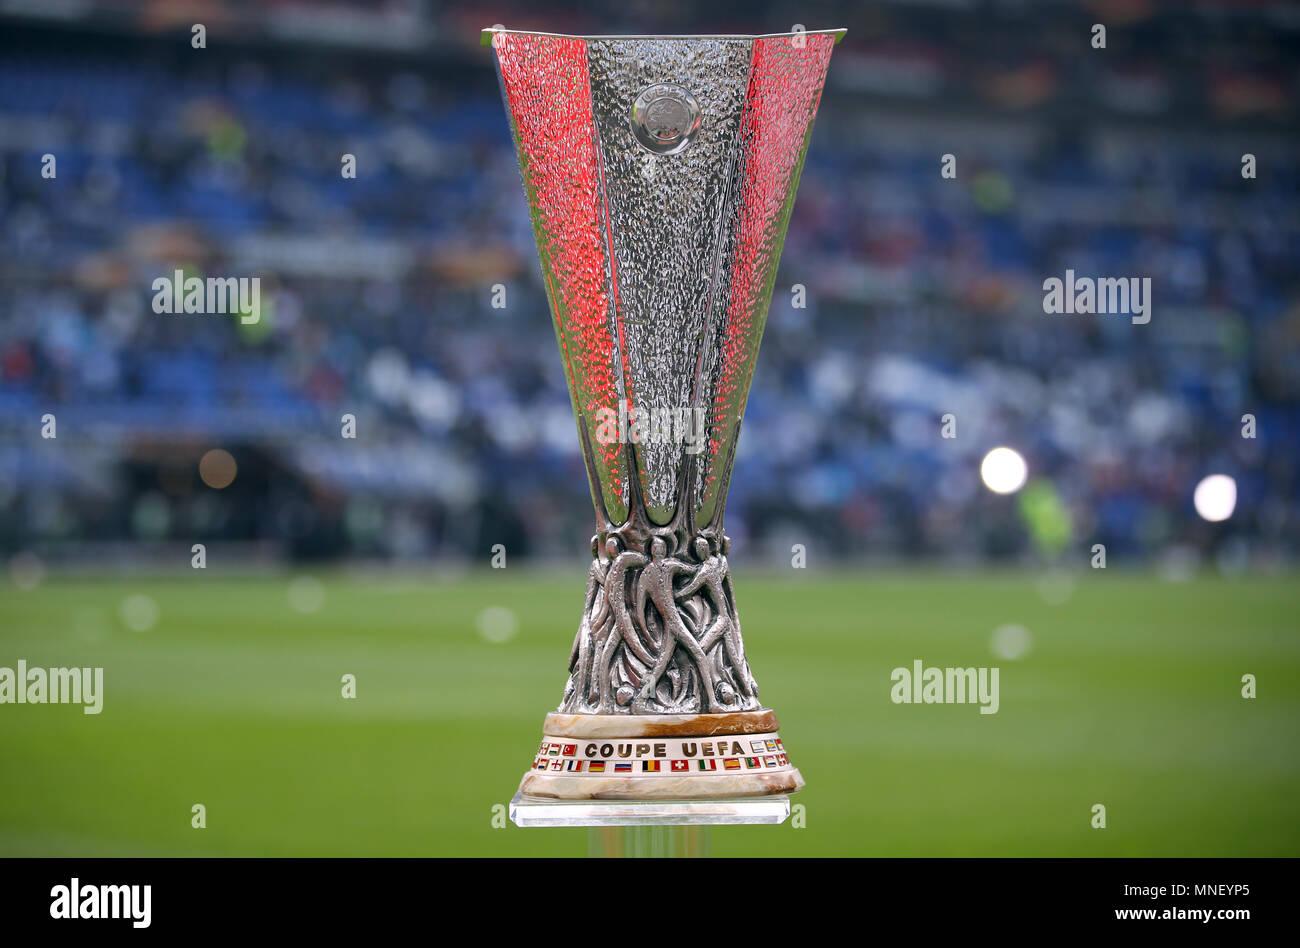 Uefa Europa Picture: Europa League Trophy Stock Photos & Europa League Trophy